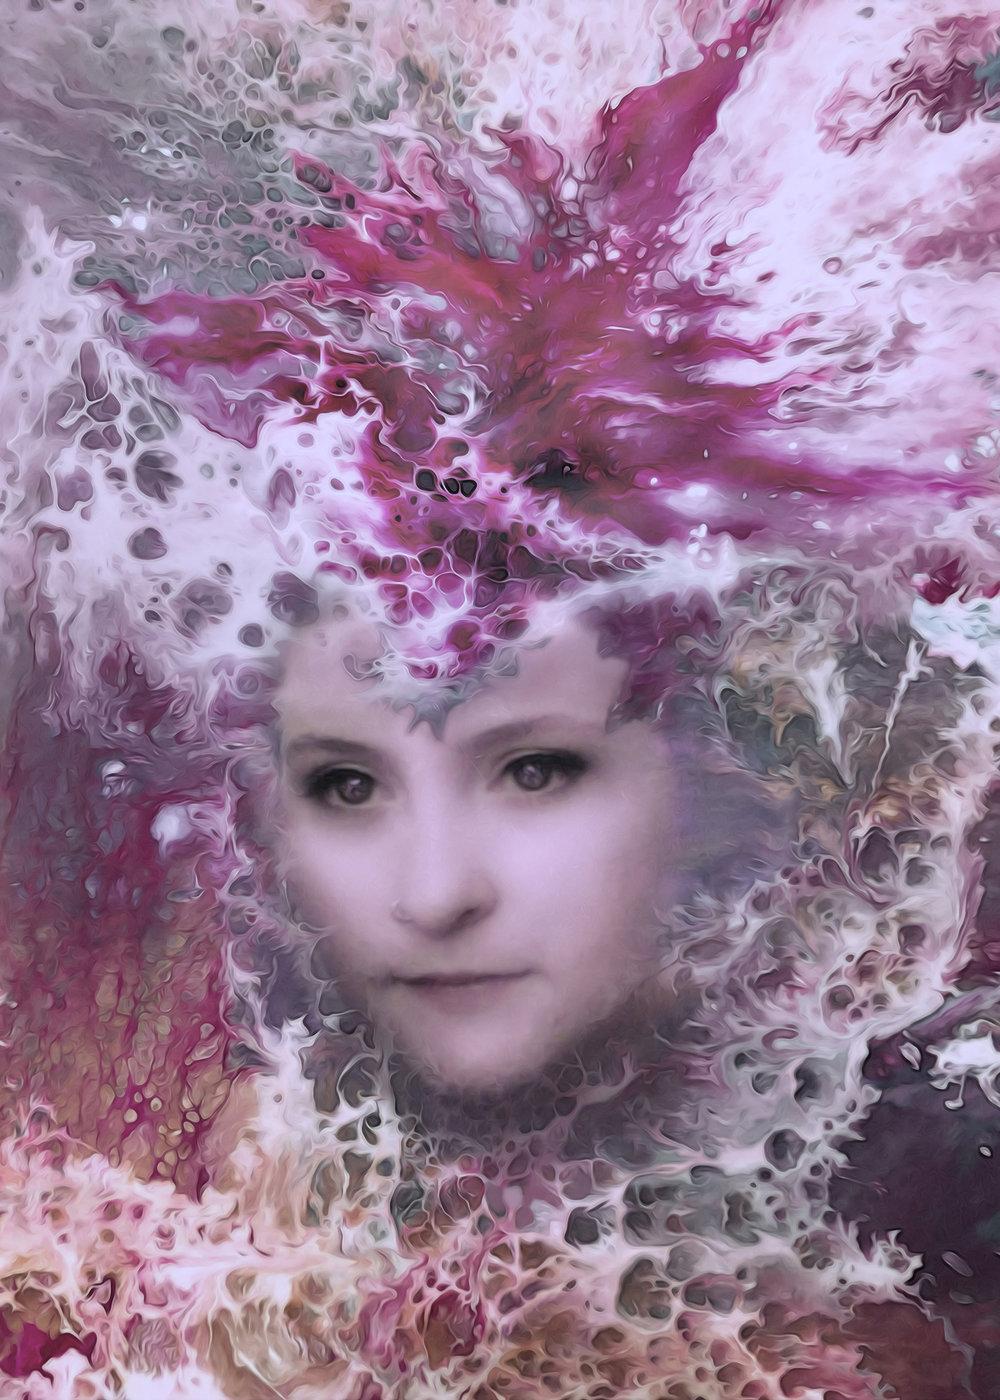 20496930-AmandaAtsalis_Sea Goddess_Acrylic-digitalgiclee_20x28_239.00.jpg